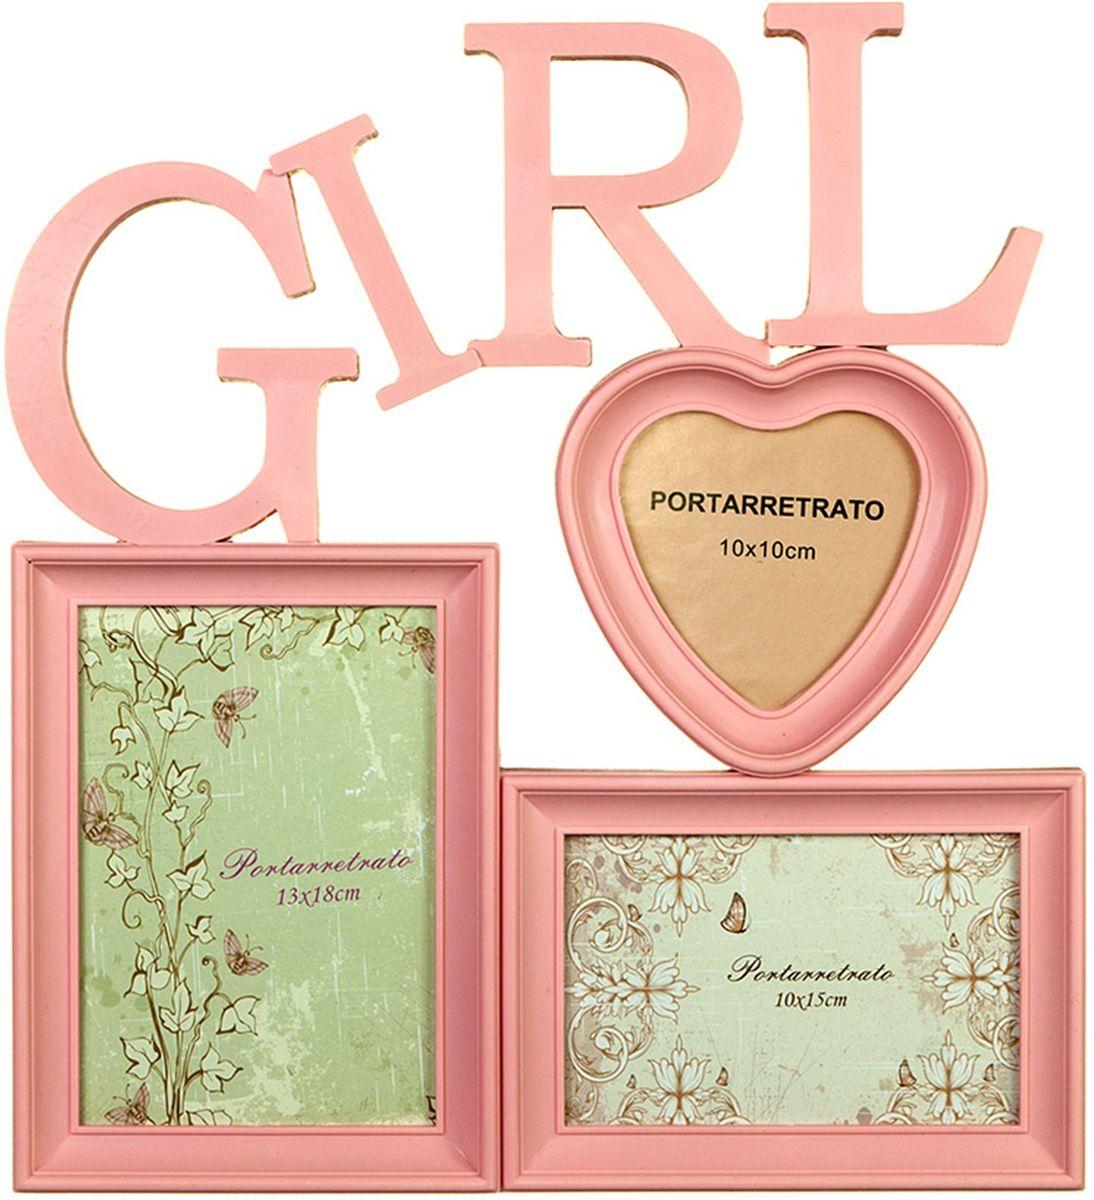 Коллаж Platinum Girl, цвет: розовый, 3 фоторамки. BIN-1122915BIN-1122651-Color-Колор миксПластиковый коллаж с 1 фото 13х18, 1 фото 10х15 см, 1 фото 10х10 см.